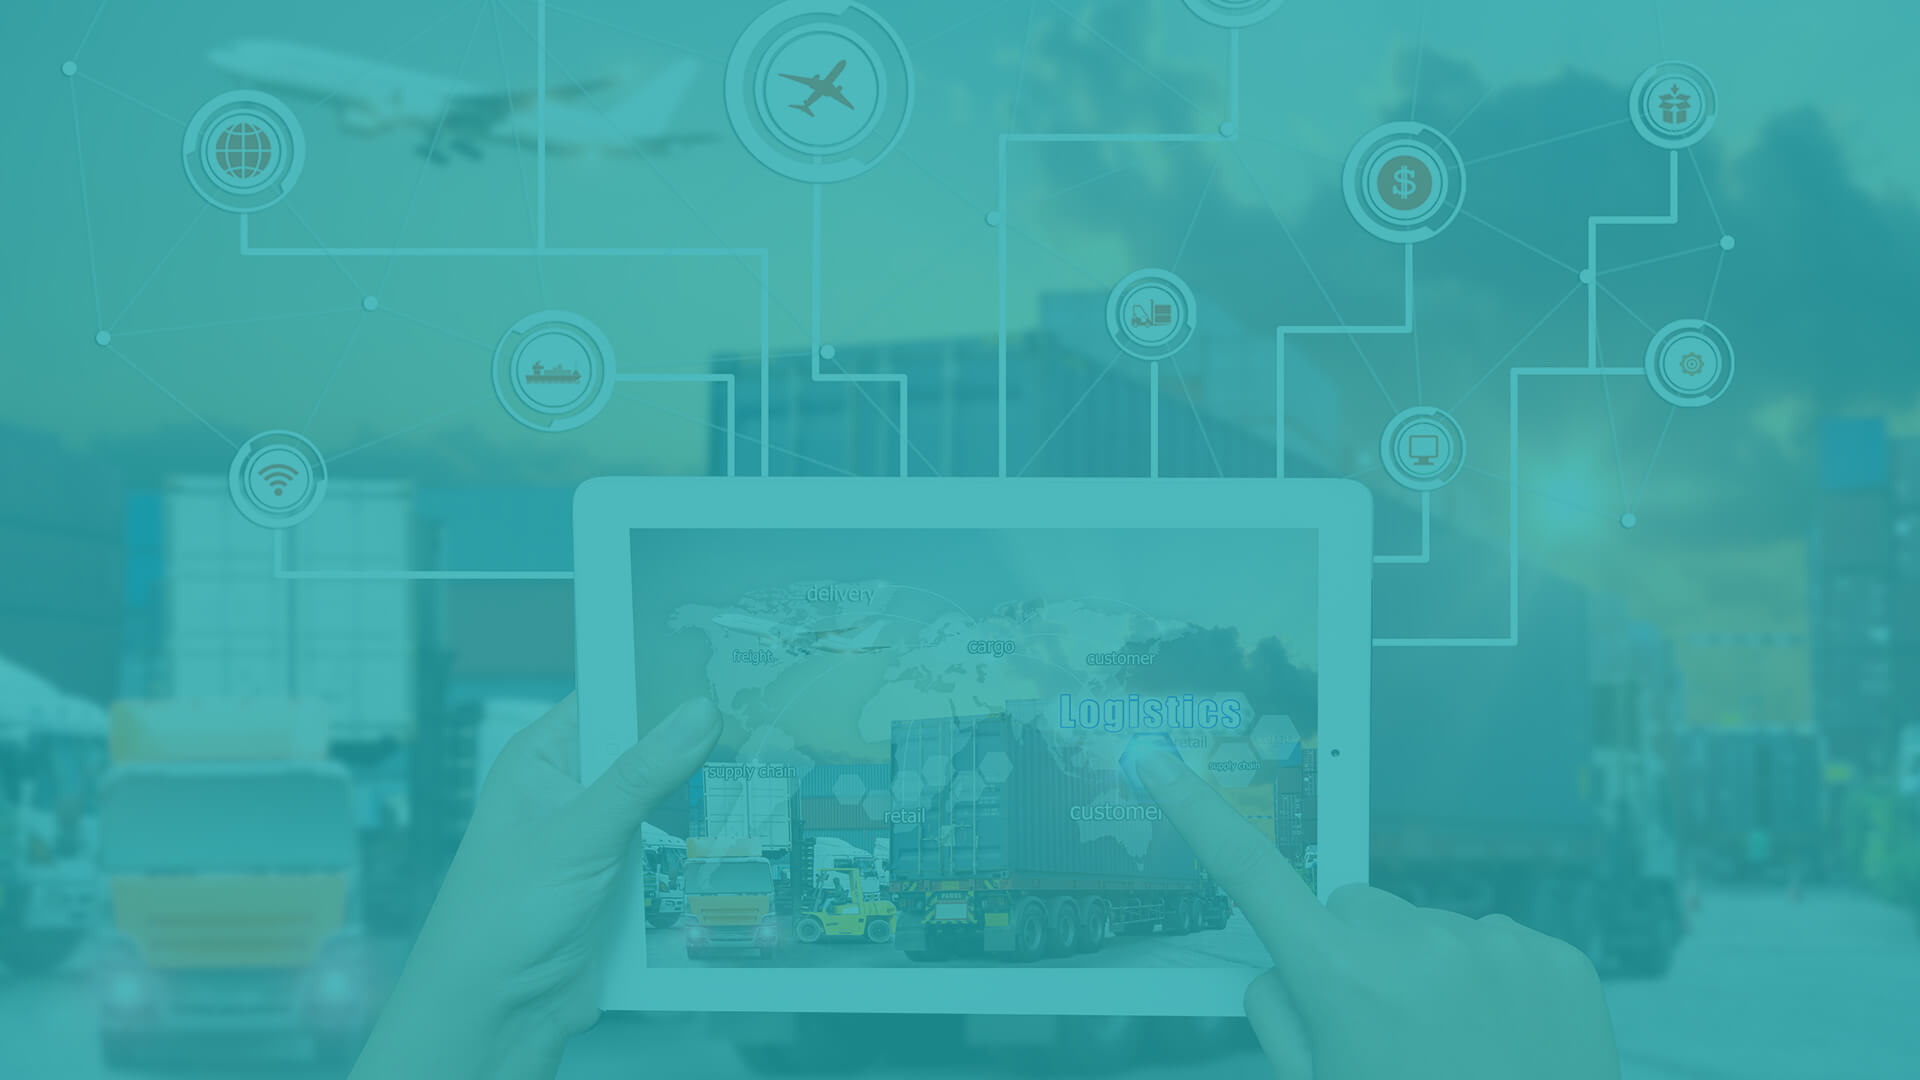 Shipping Logistics Software Development Services | SCM | Chetu